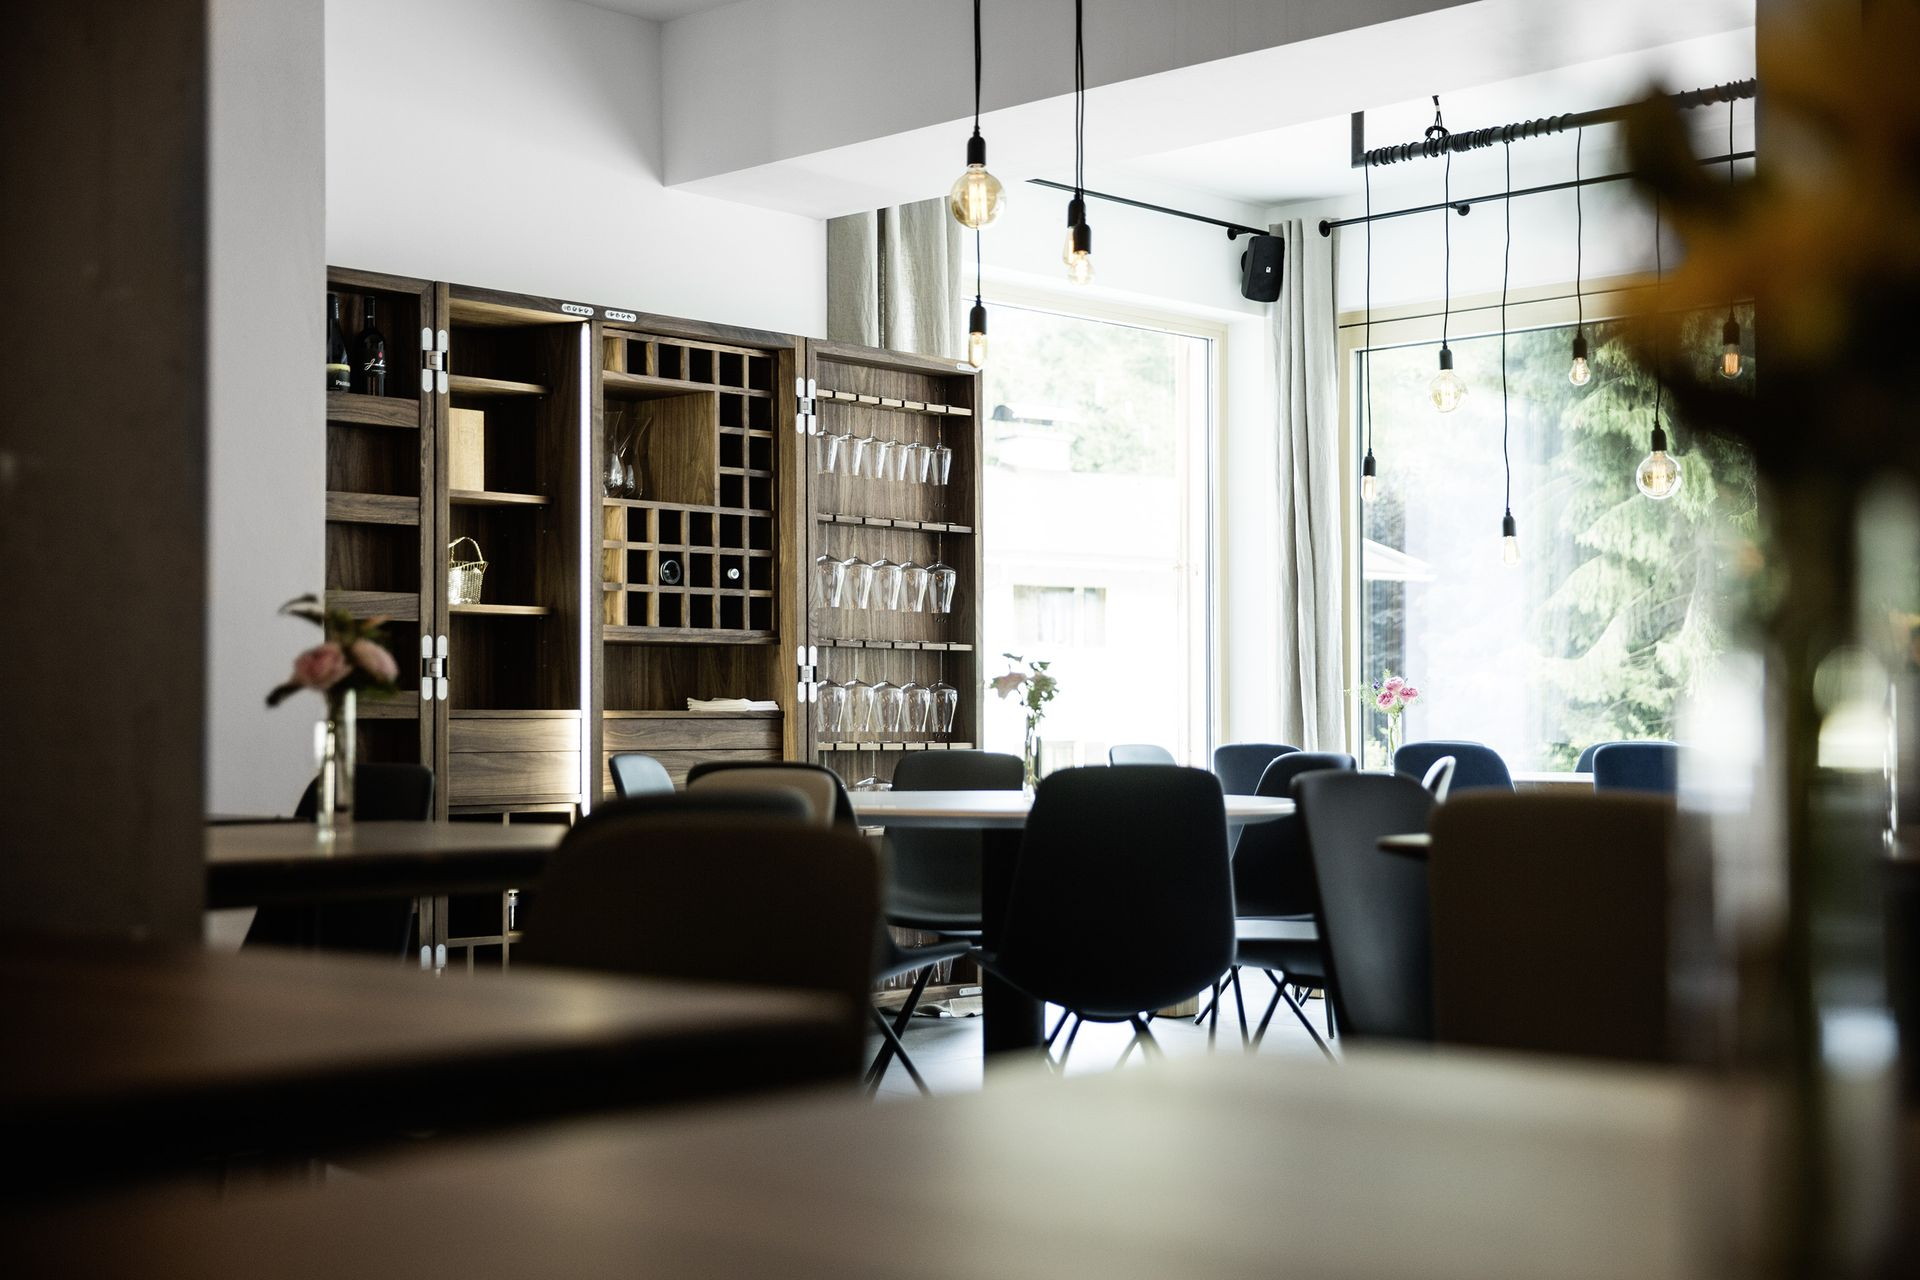 Kochschule Hotel Tiroler Buam - RAUMCONCEPT - Planungsbüro für ... | {Kochschule architektur 27}